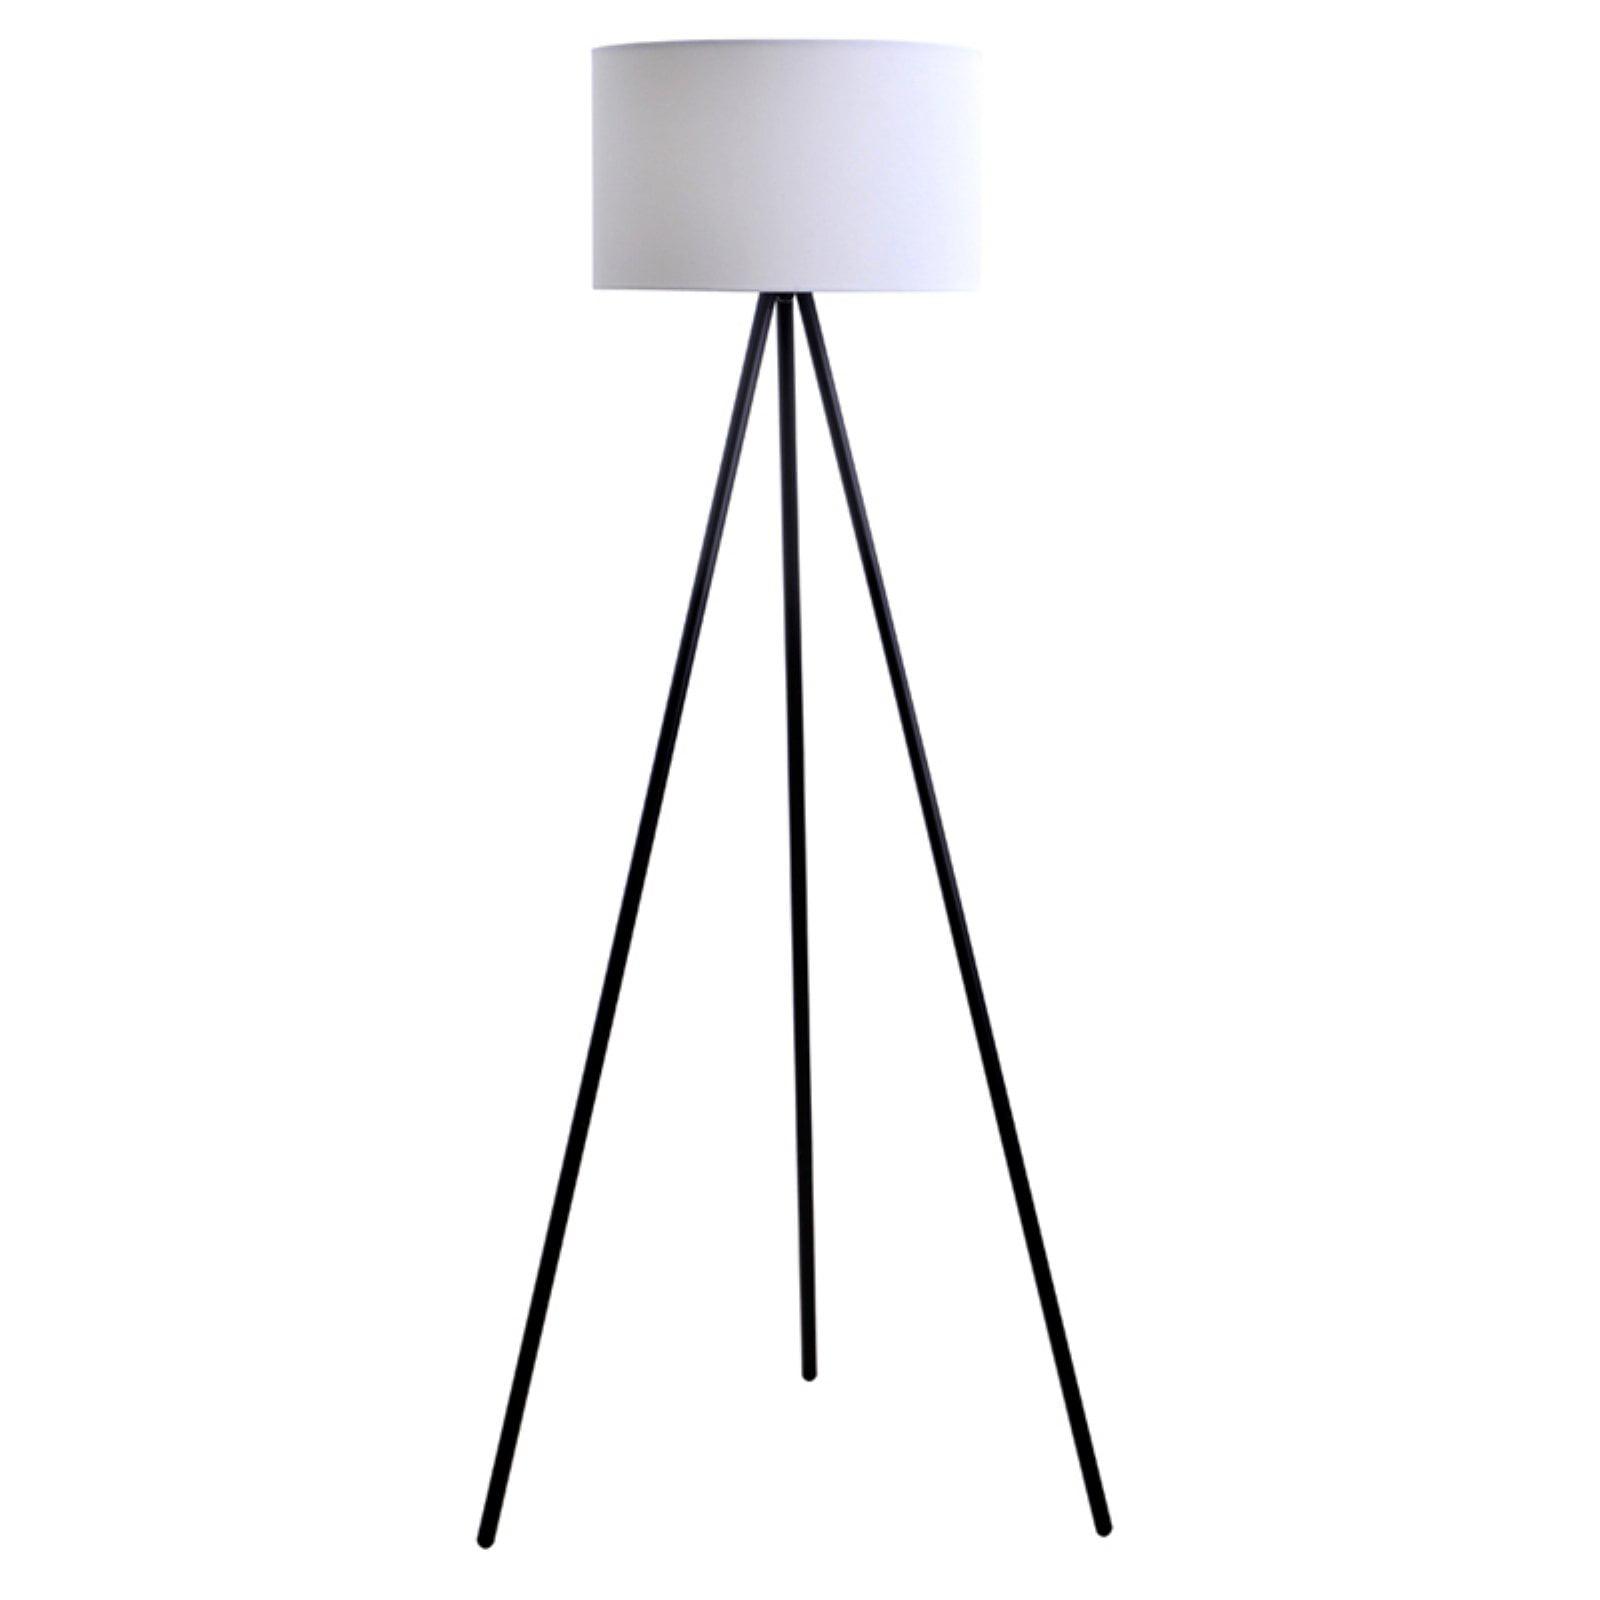 "Catalina 61.25"" Mid-Century Tripod Floor Lamp, Black Finish by Evolution Lighting, LLC"